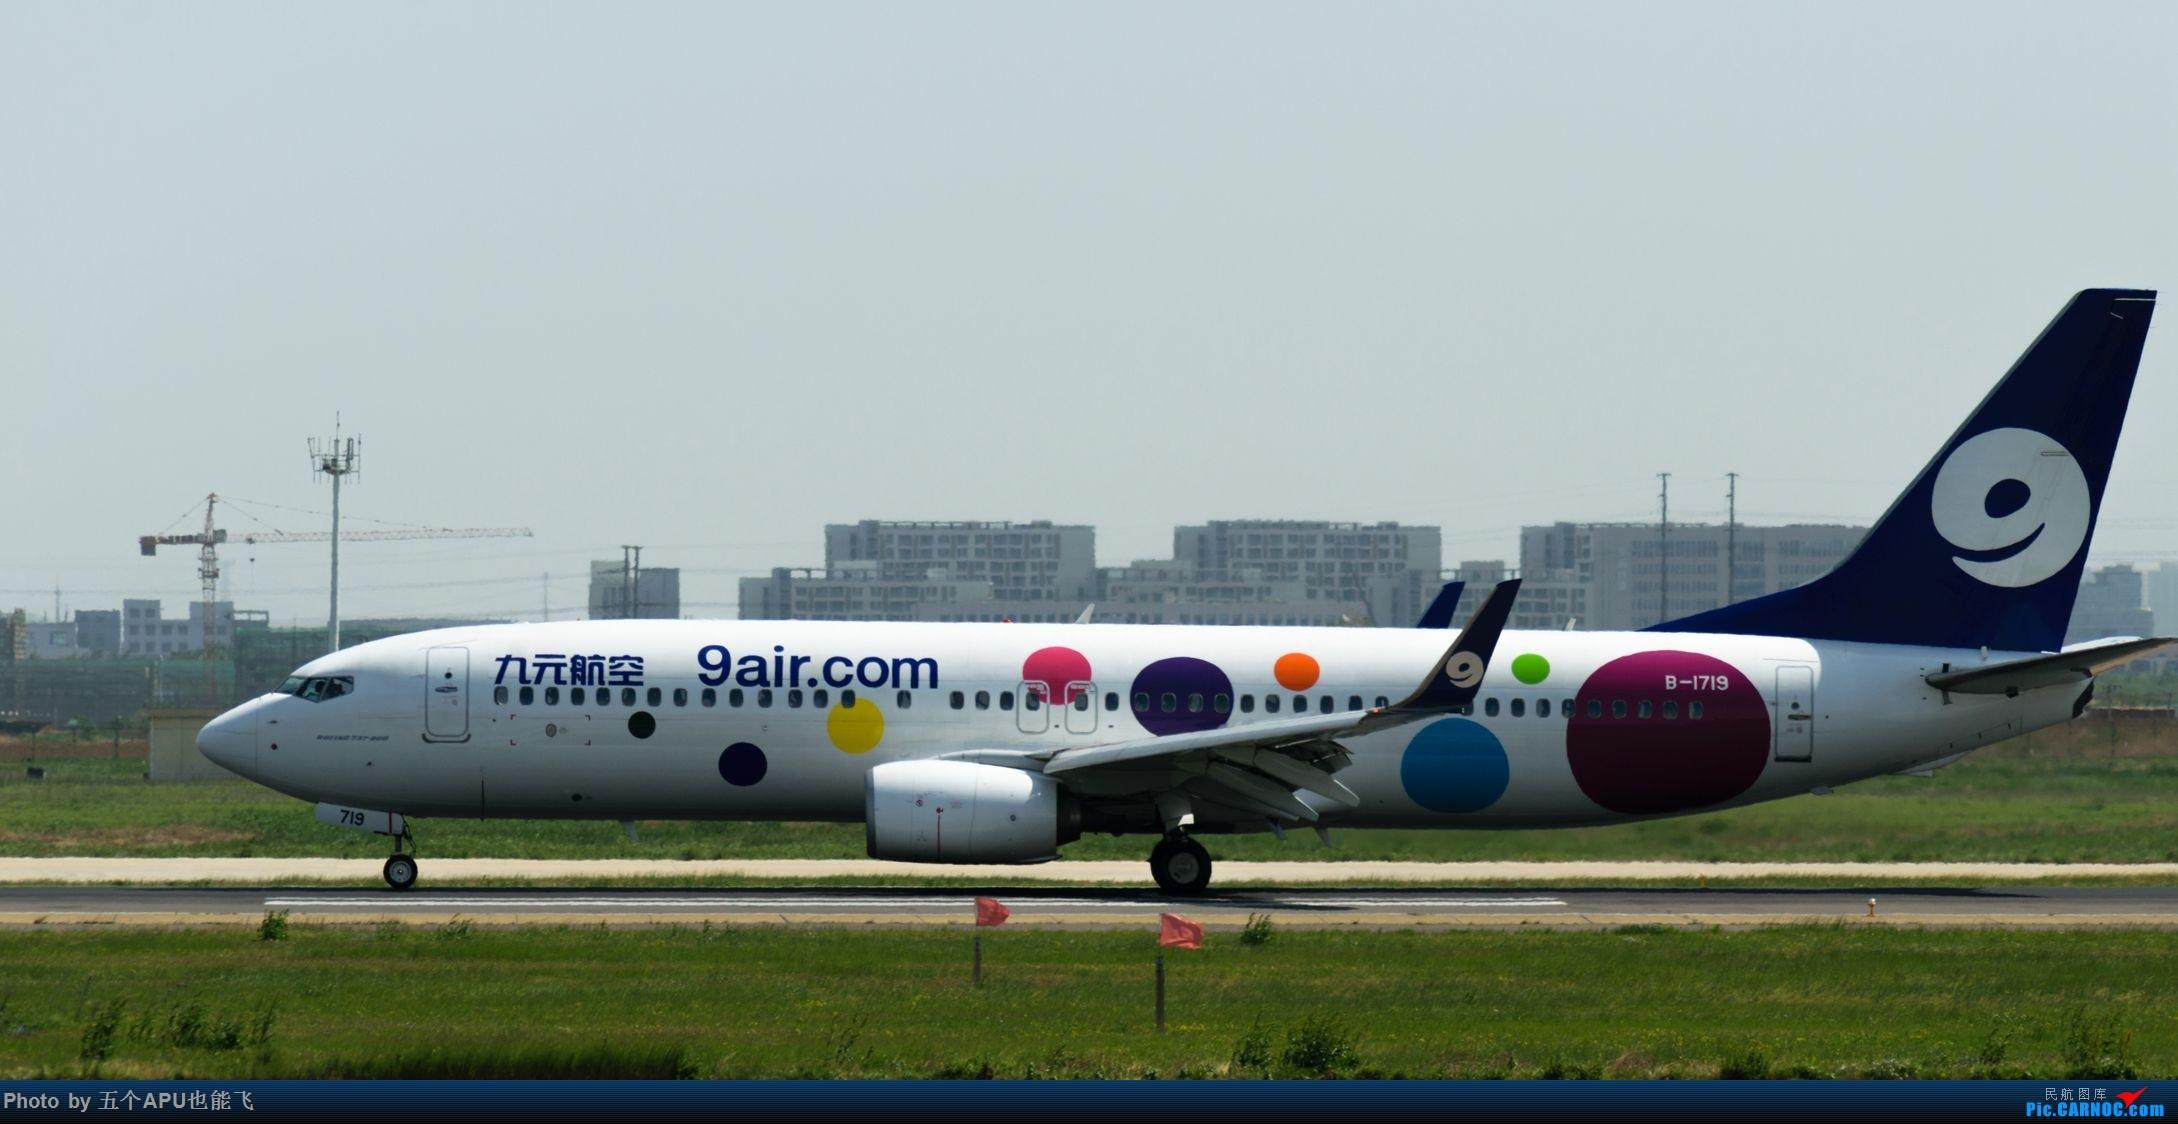 Re:[原创]TSN日常 BOEING 737-800 B-1719 中国天津滨海国际机场